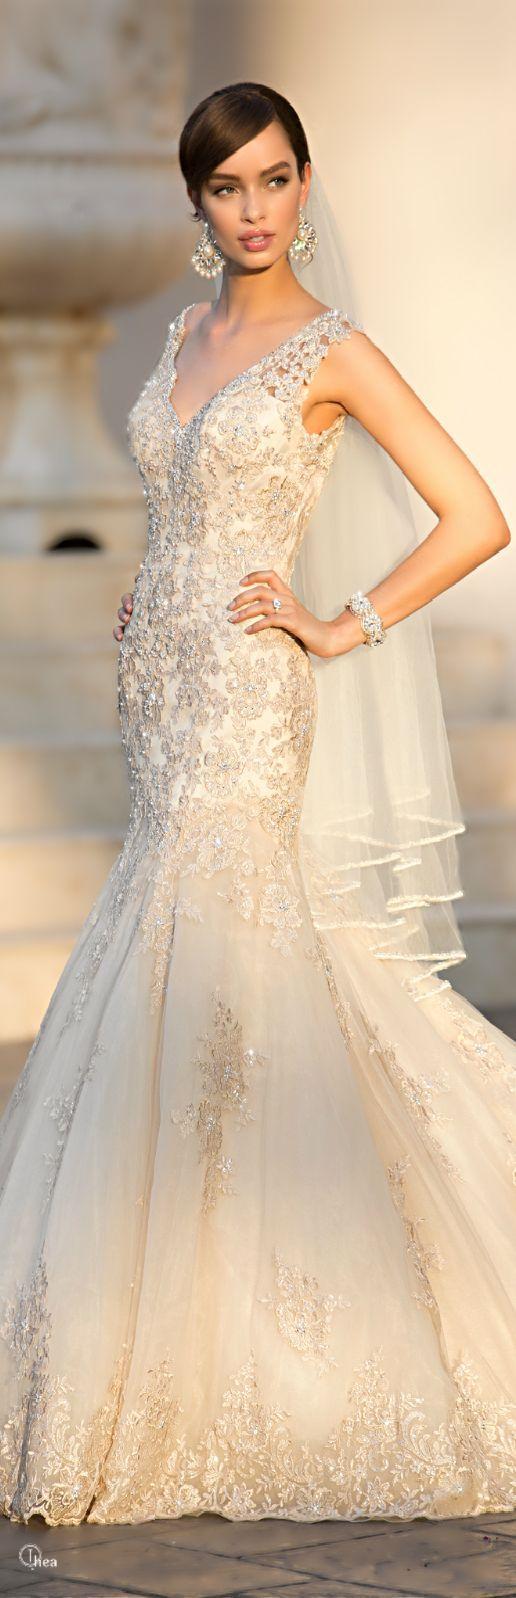 Свадьба - Weddings - Luscious Lace